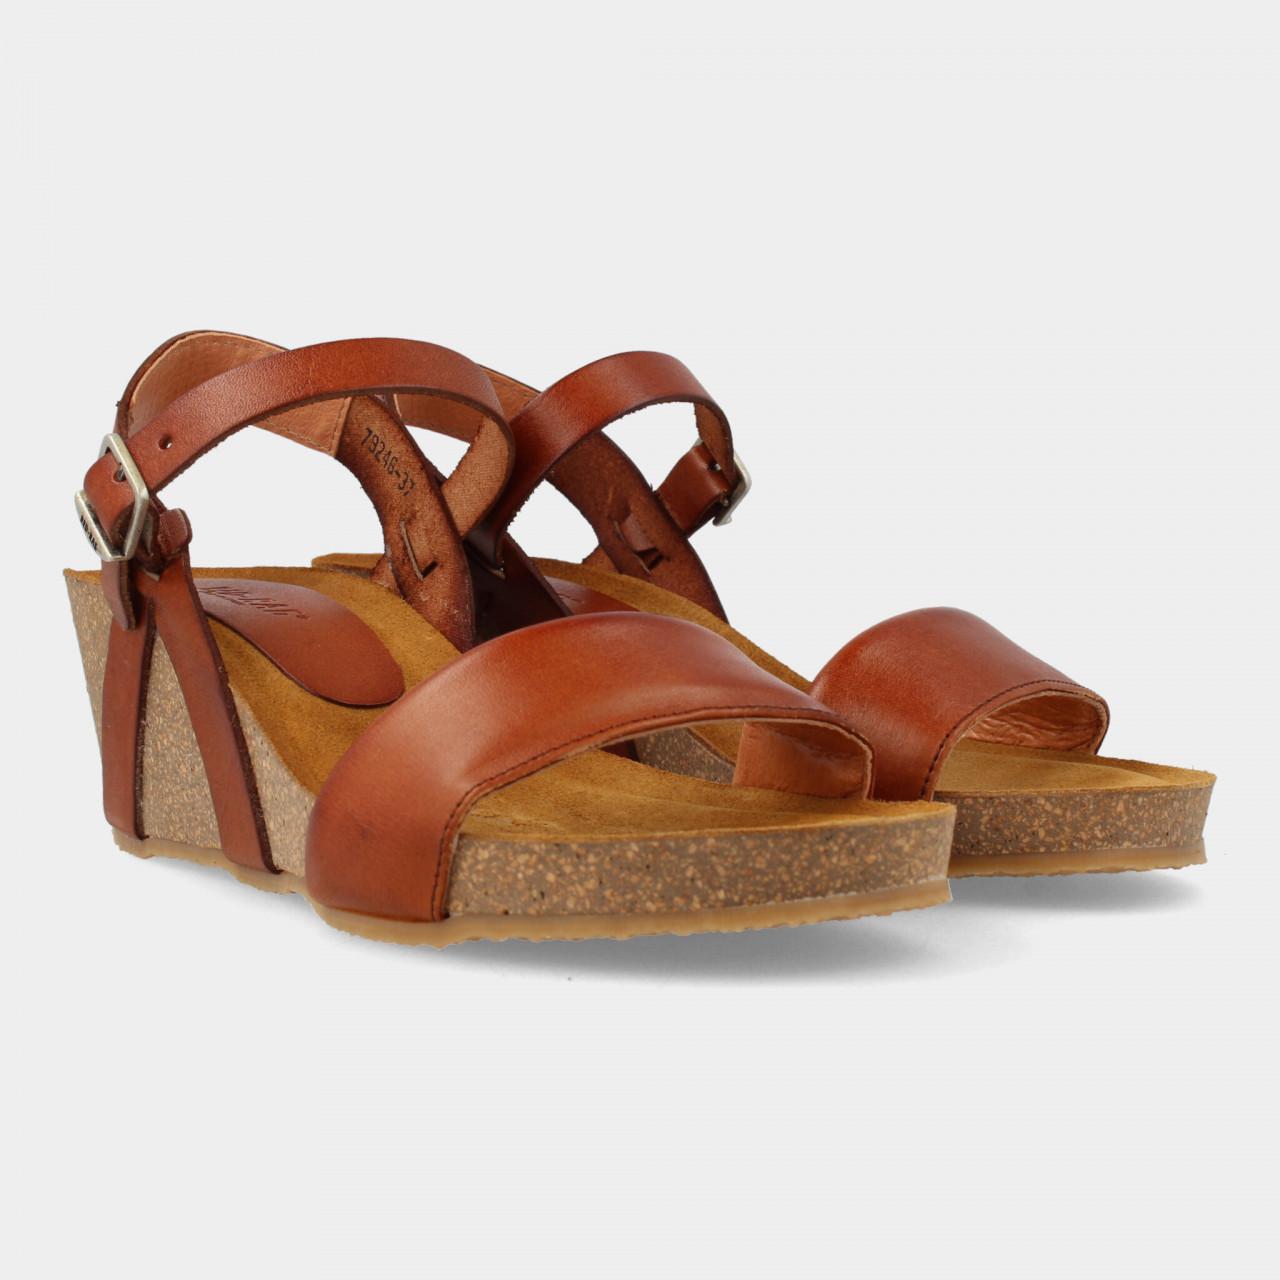 79246 | Women Sandal Wedge